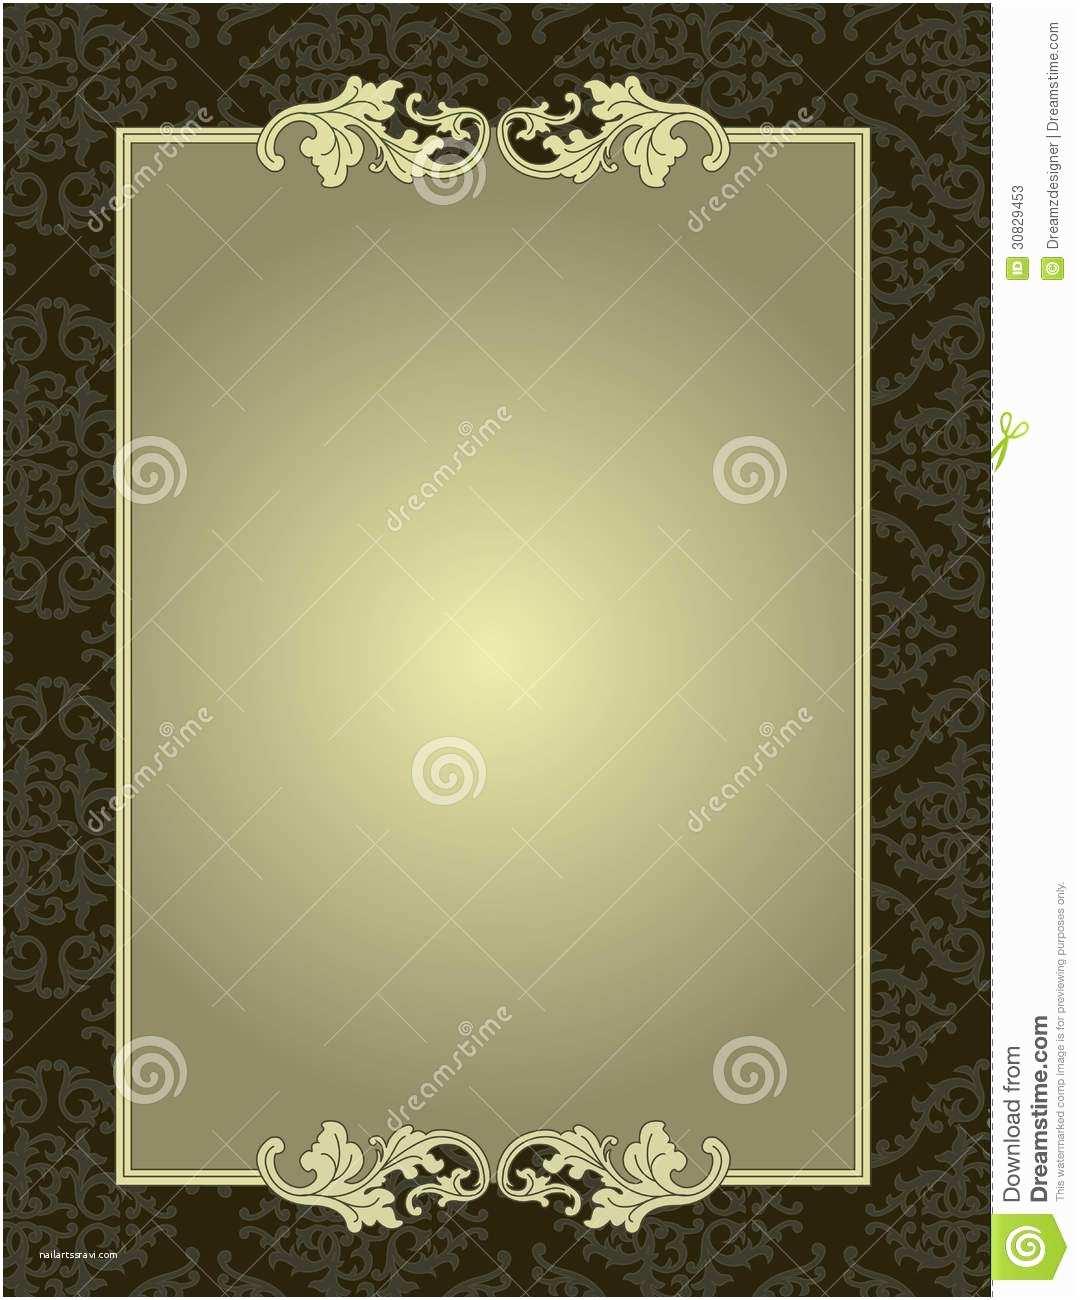 Time Frame for Wedding Invitations ornamental Frame Damask Pattern Background Card Stock